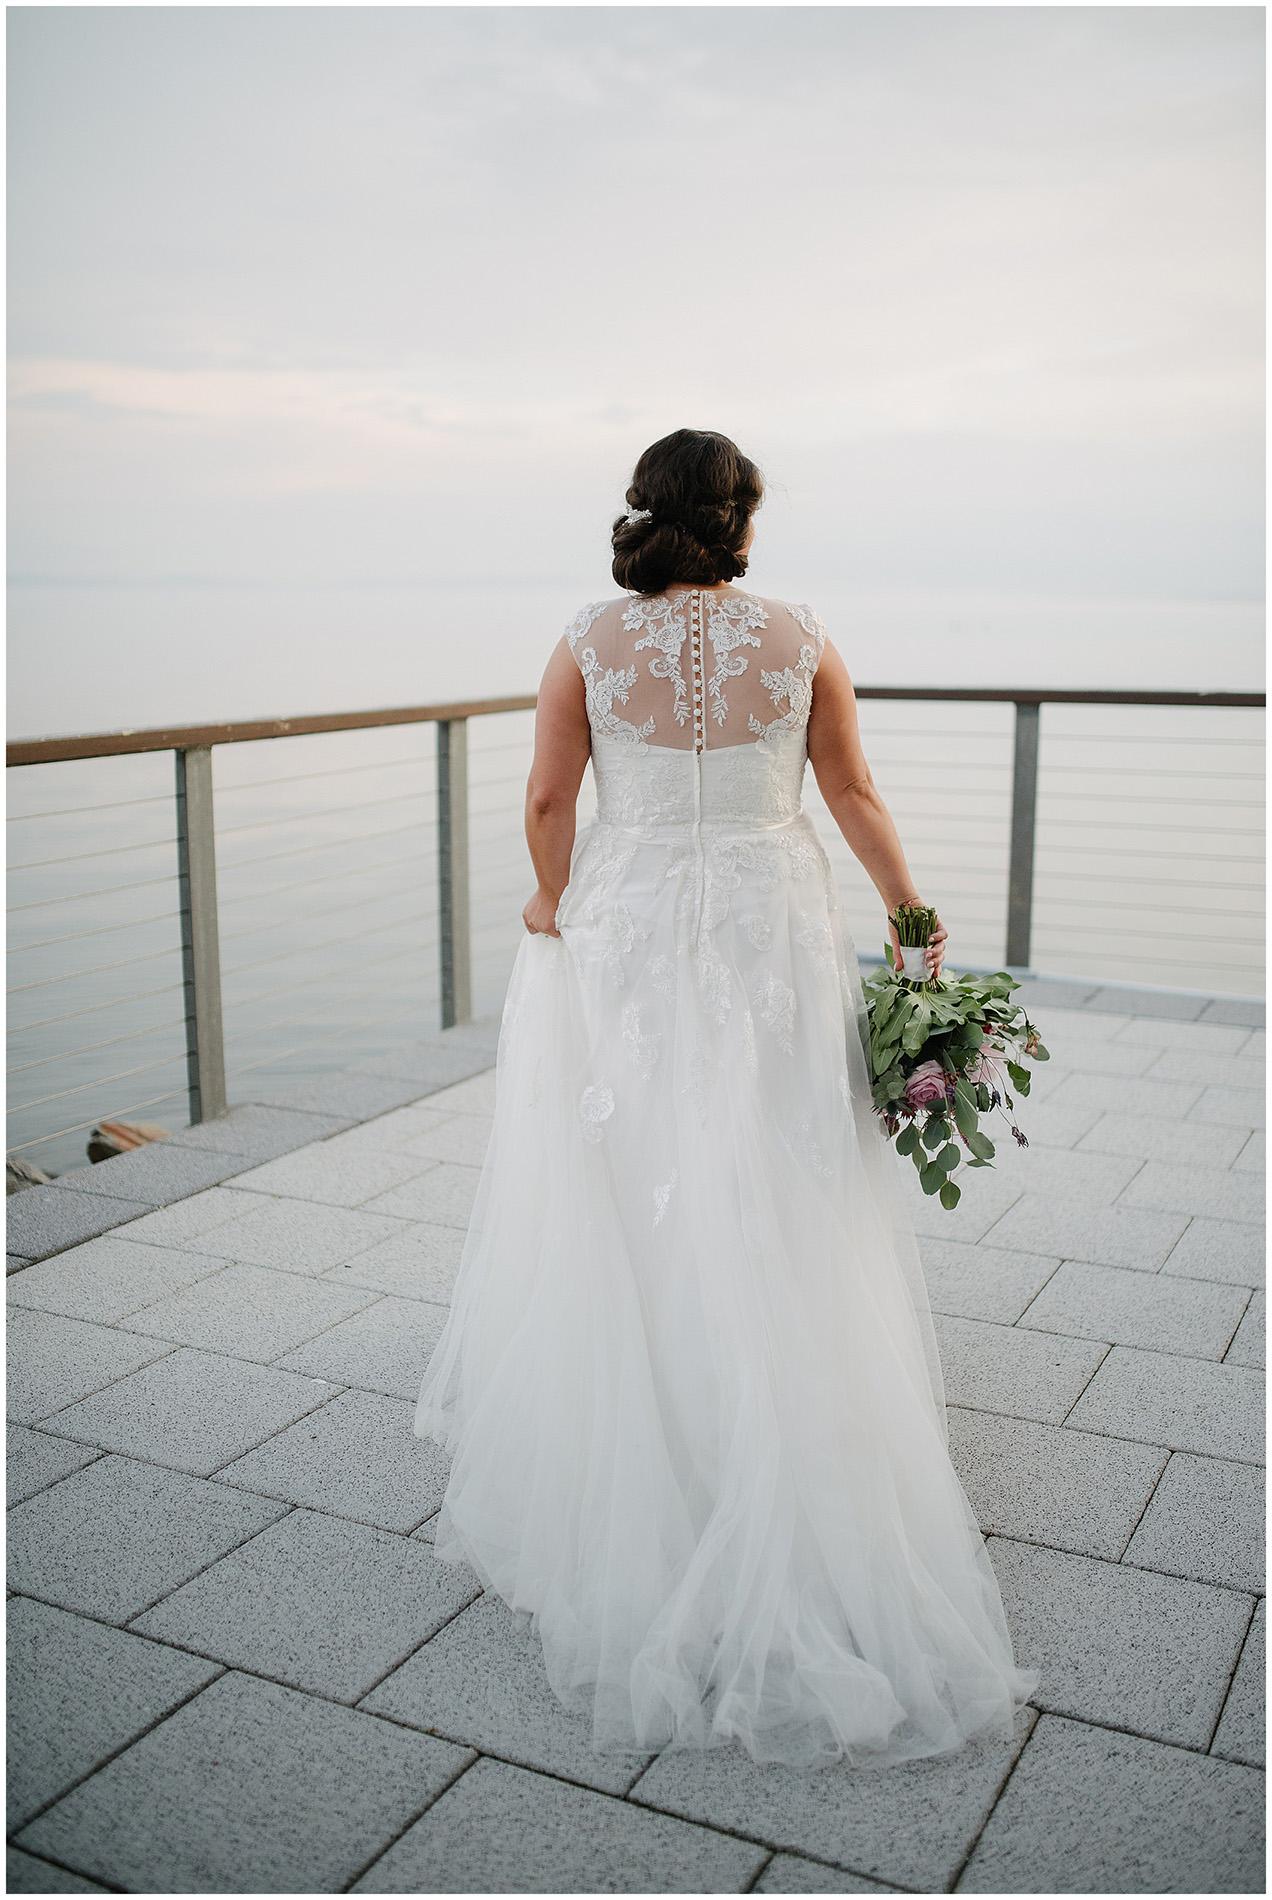 redcastle-hotel-wedding-karen-brian-jude-browne-photography-134.jpg